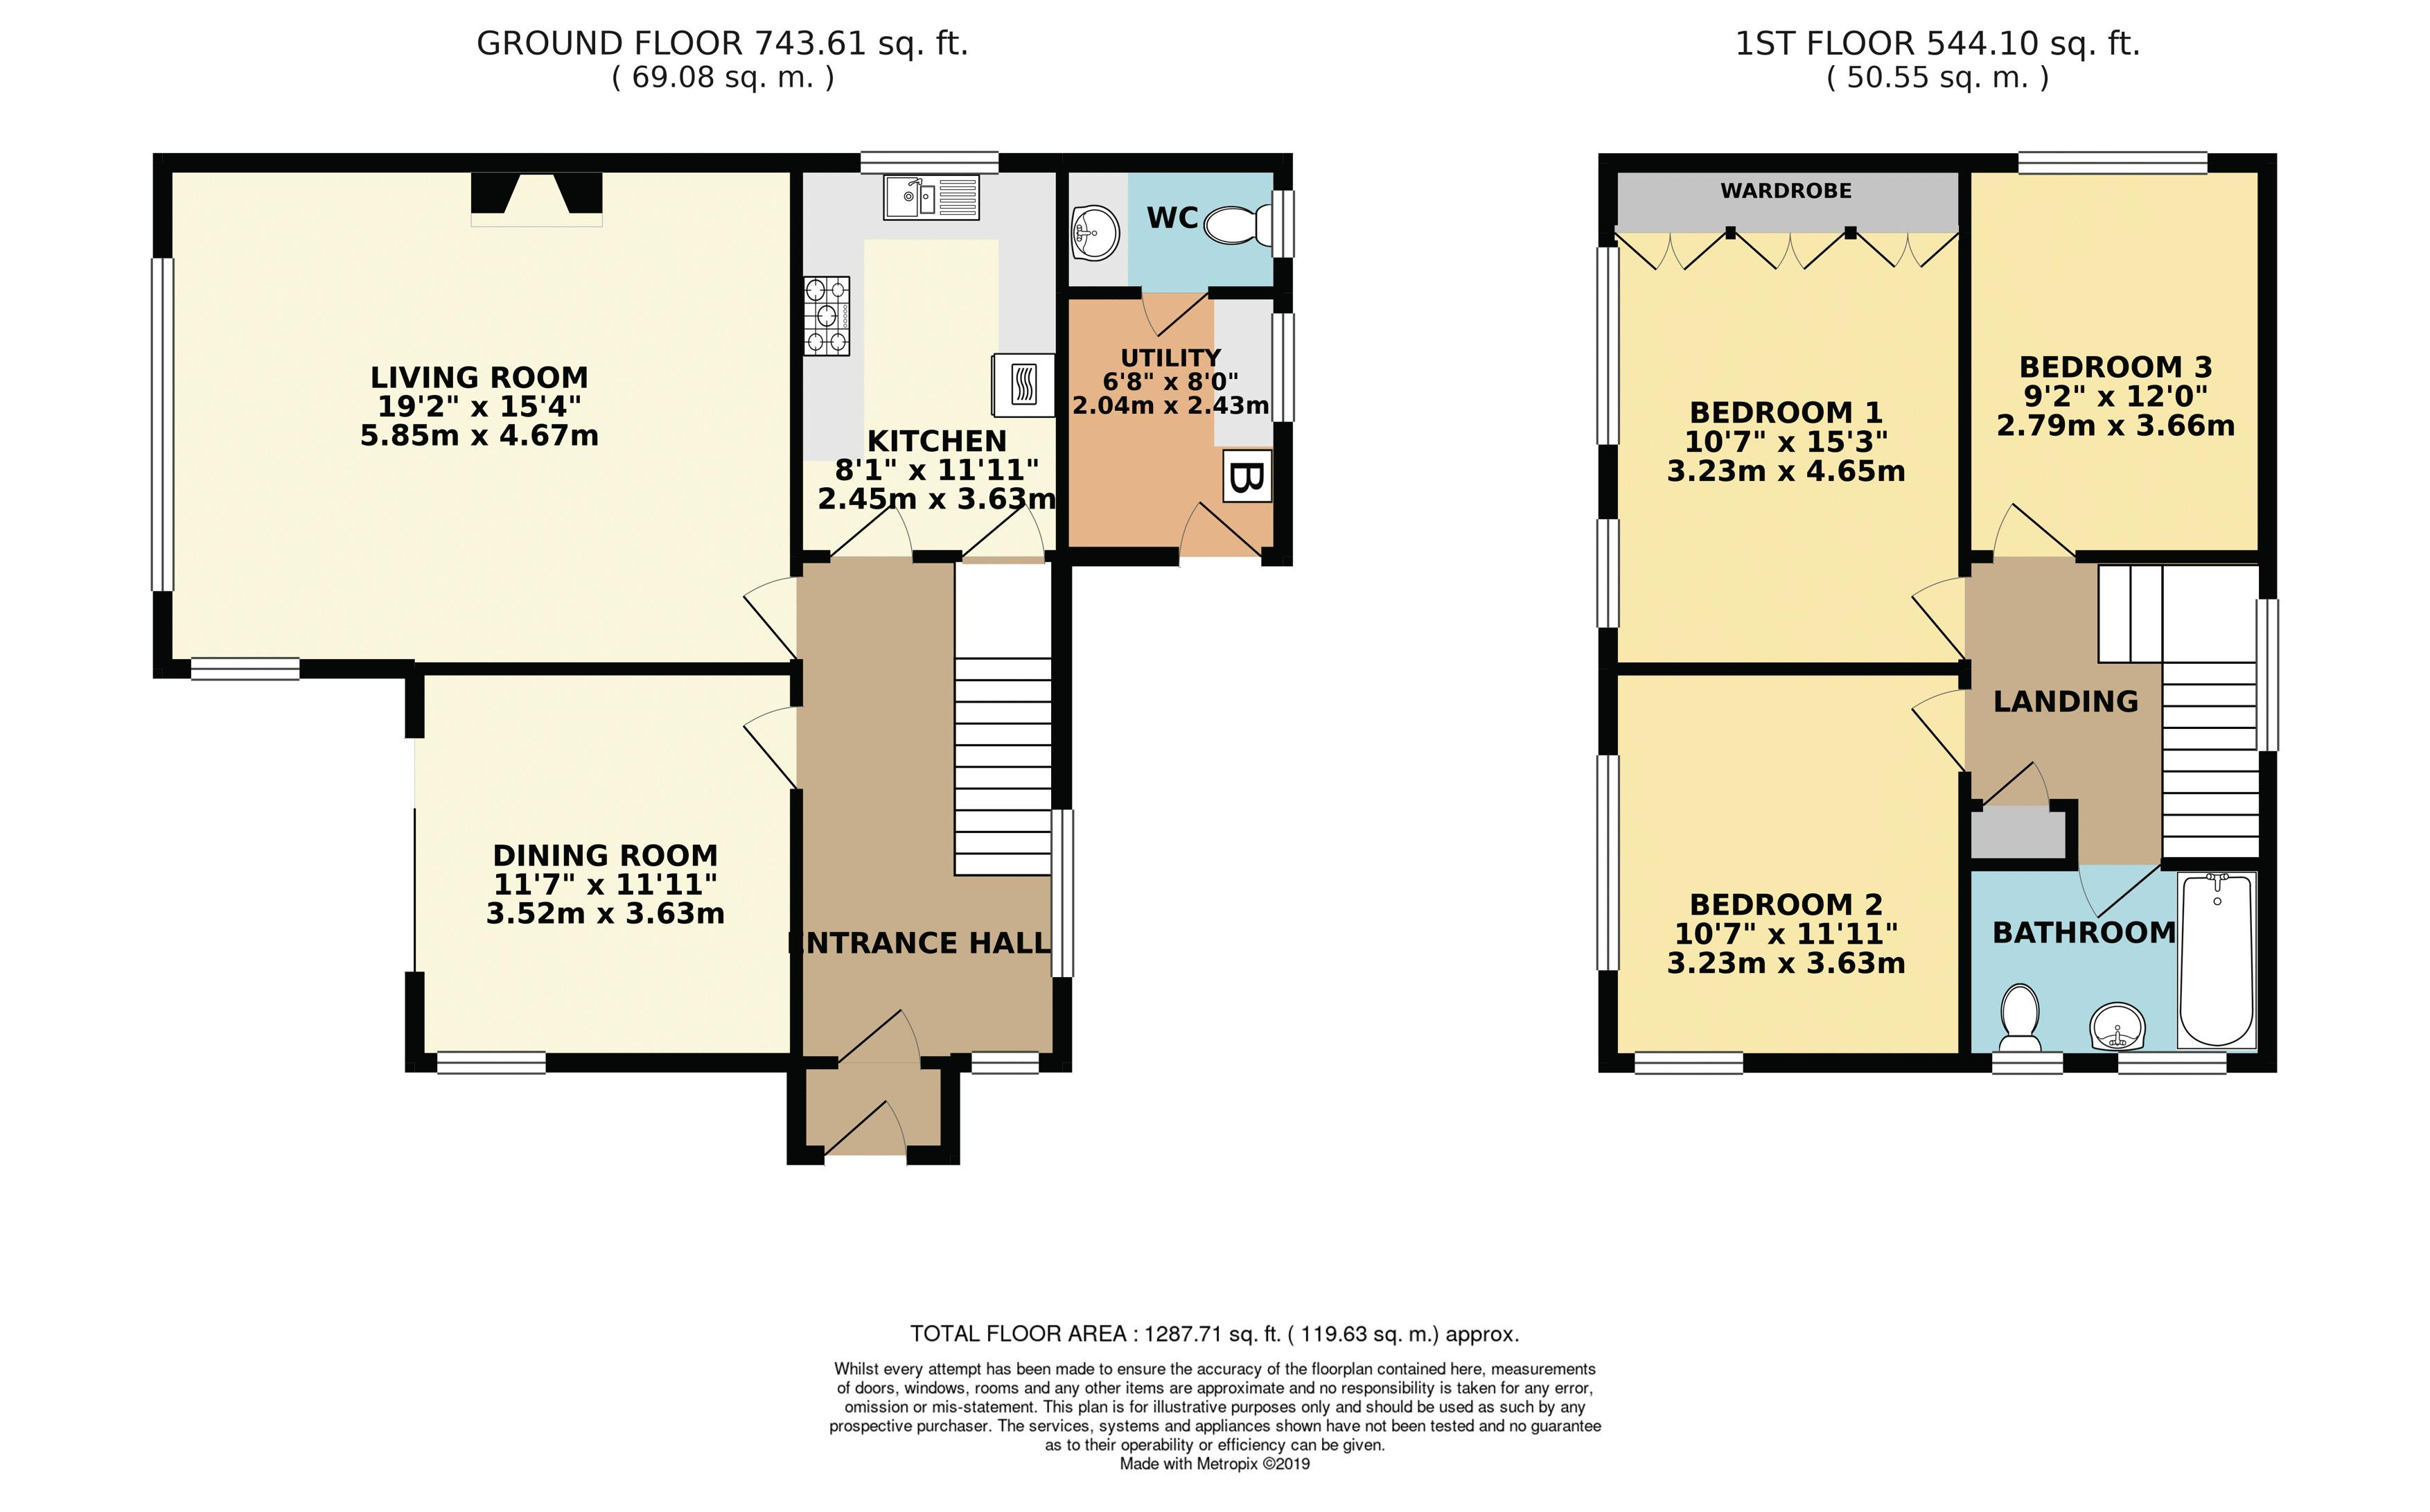 Floorplan Colour